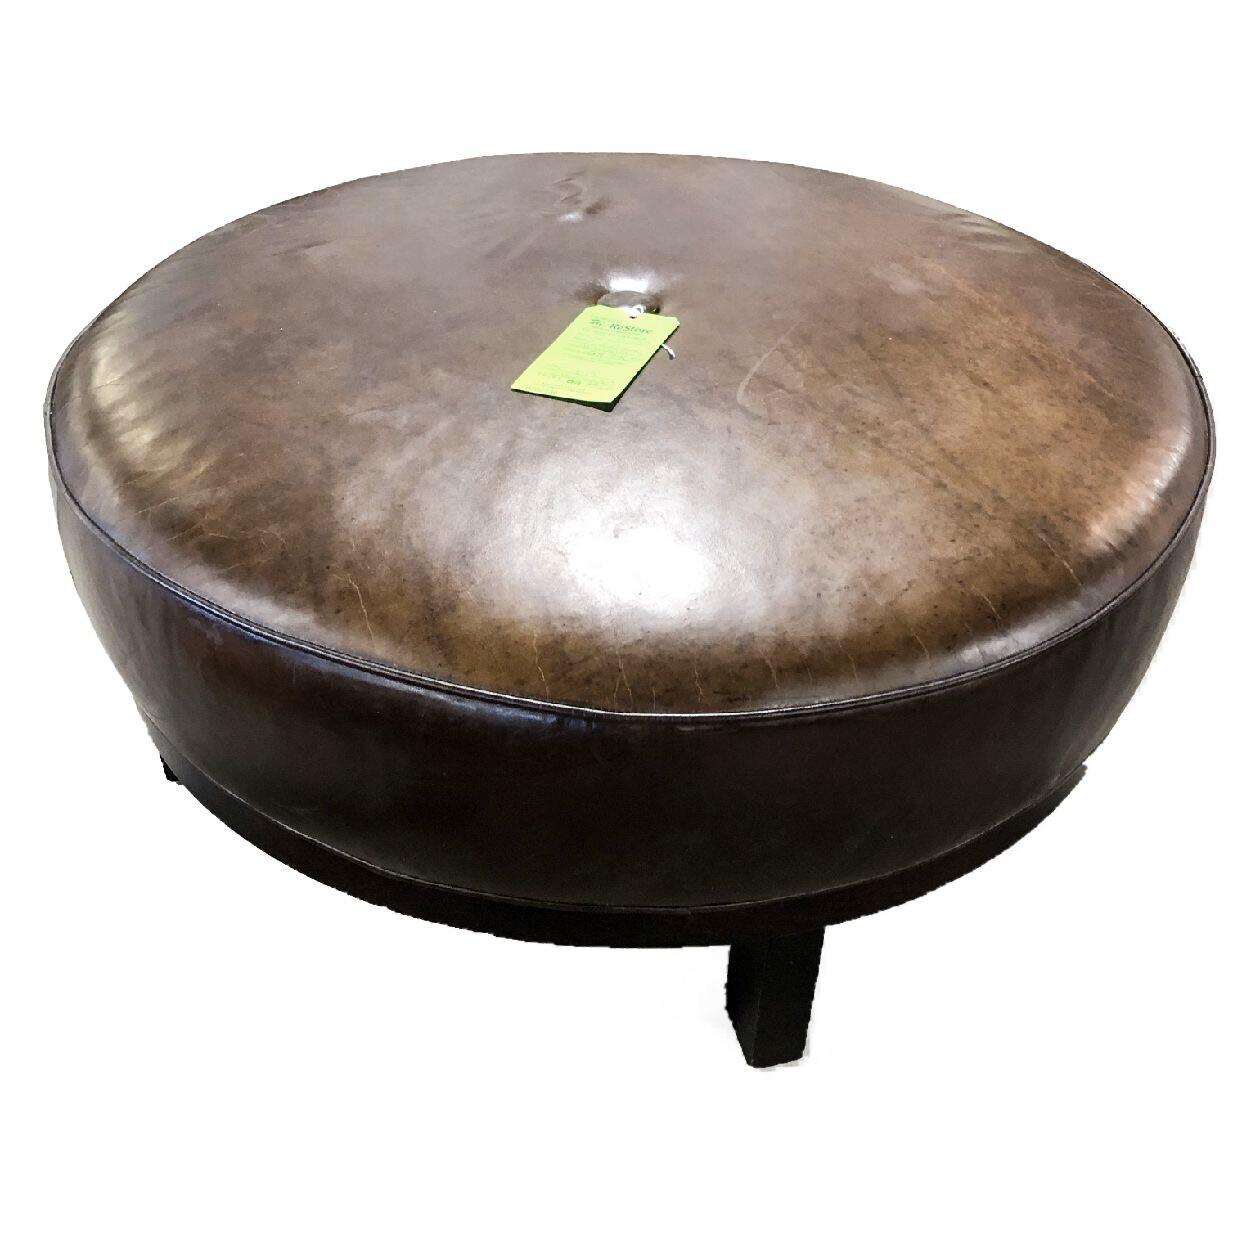 Crate & Barrel Leather Ottoman